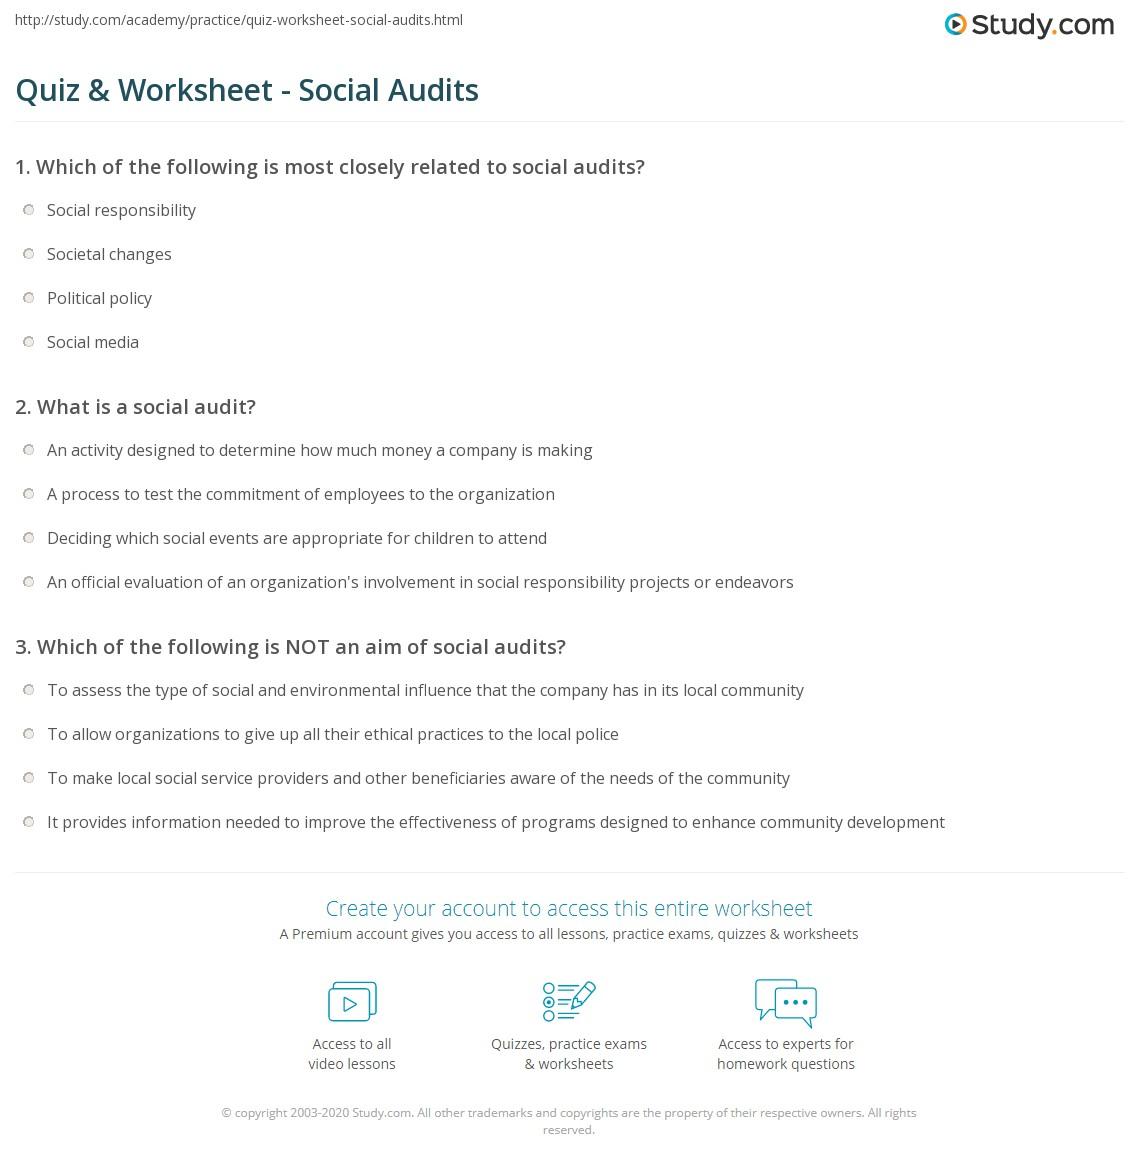 Worksheets Worksheet-audit quiz worksheet social audits study com print what is a audit definition examples worksheet